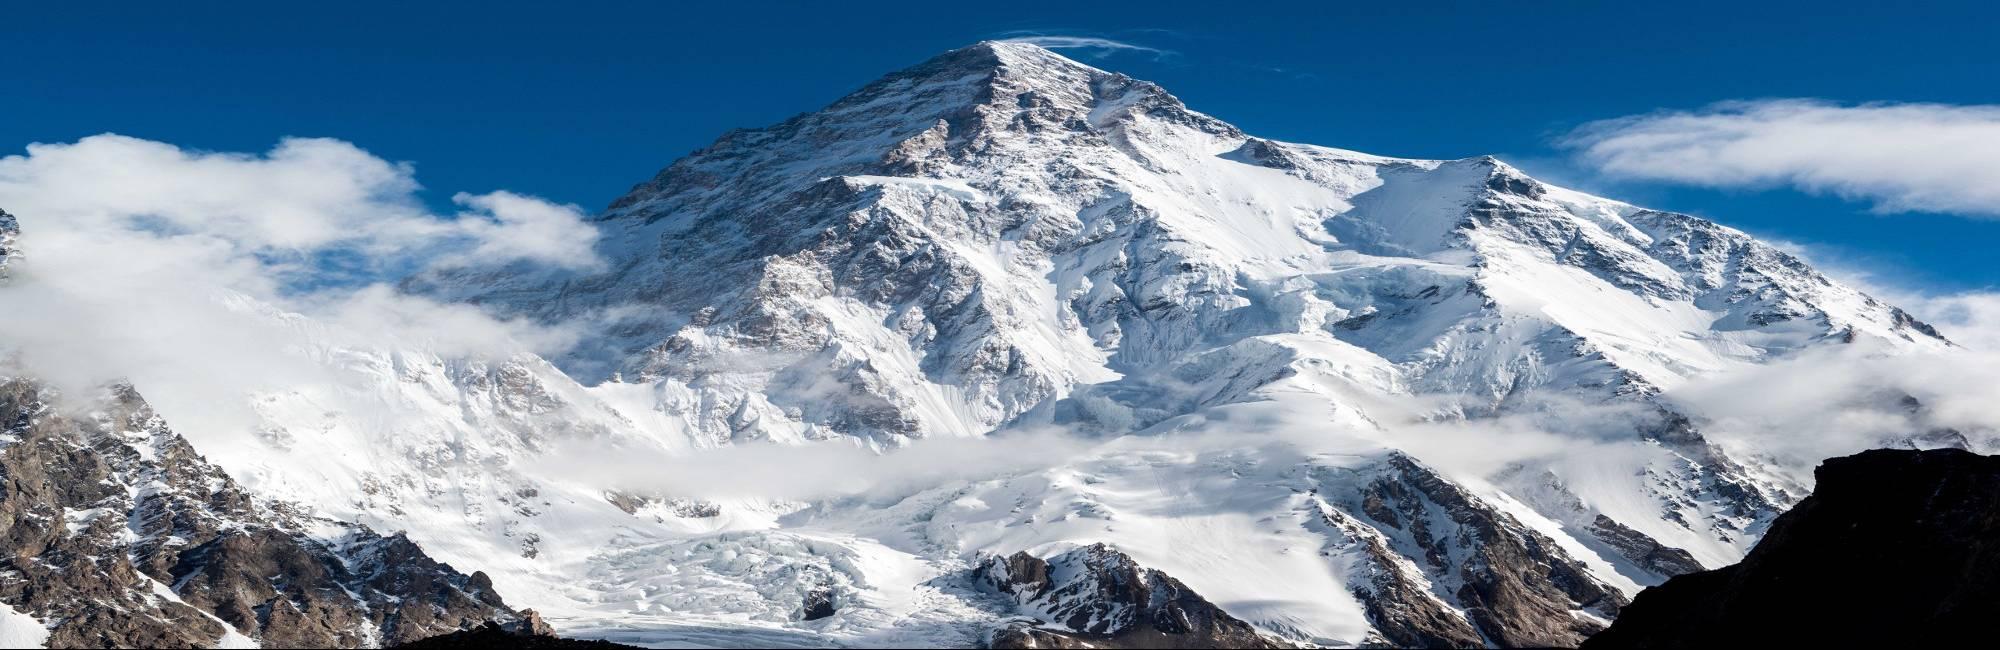 icy mountain peak